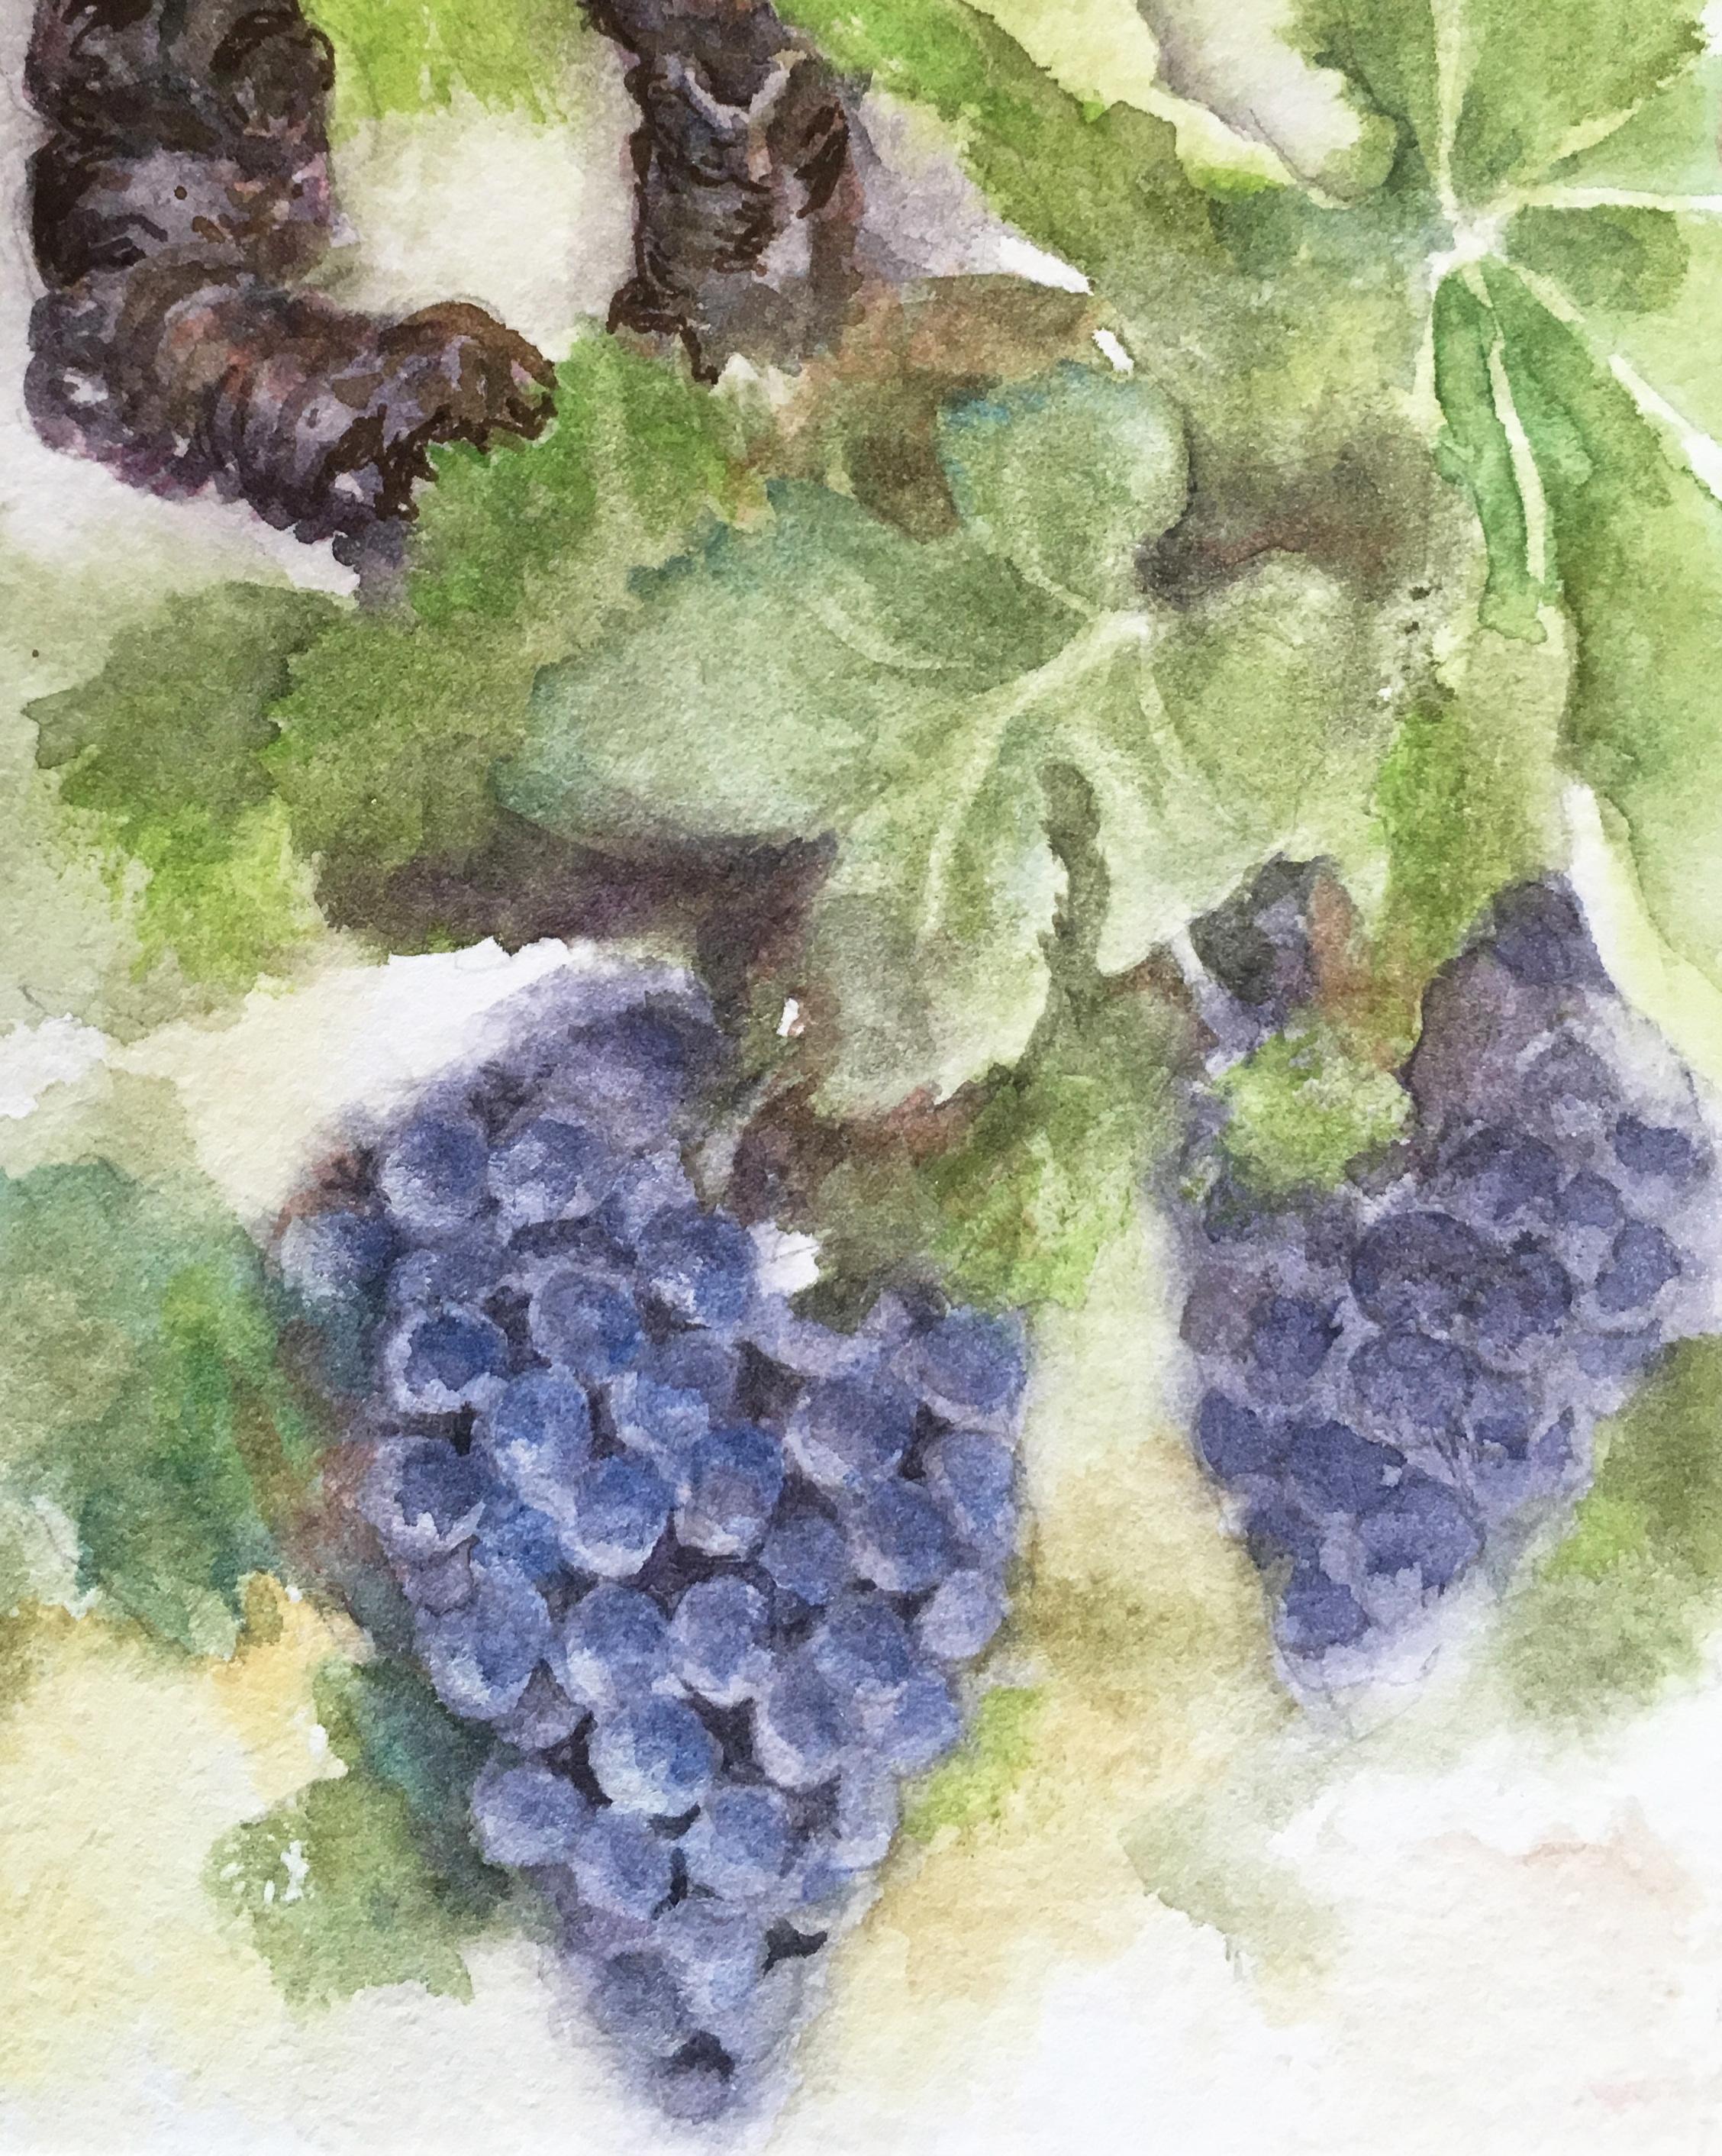 grapes+on+the+vine.jpg